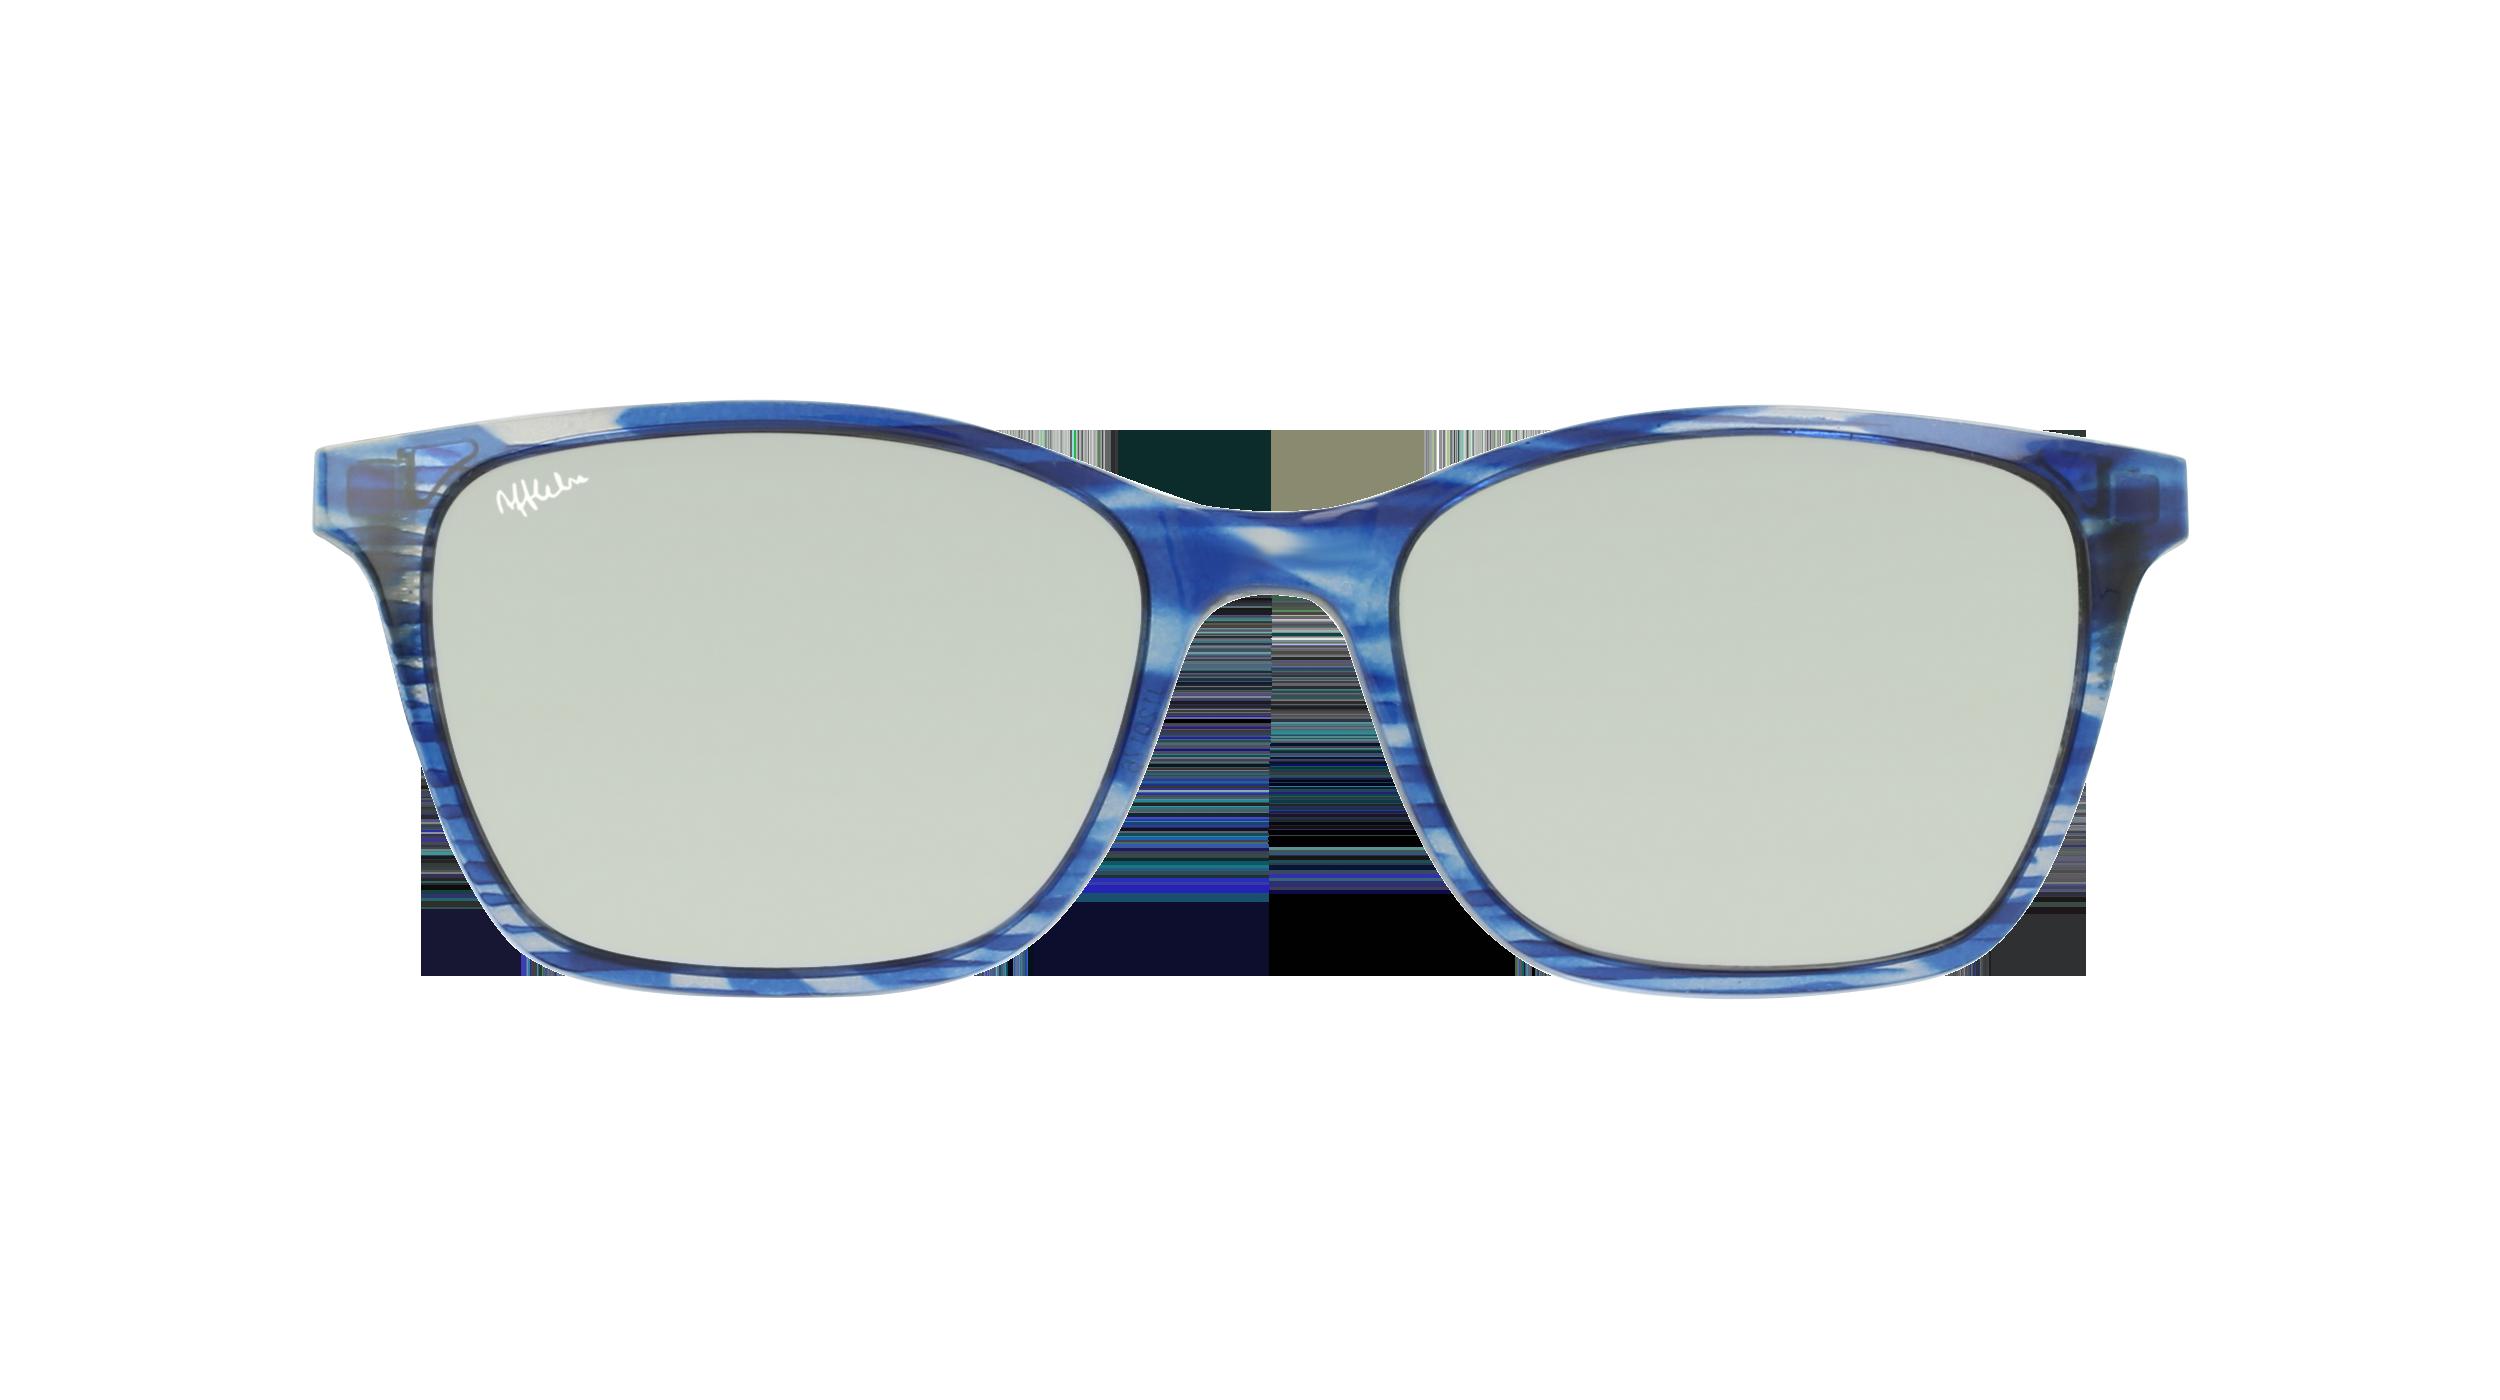 afflelou/france/products/smart_clip/clips_glasses/07630036457672.png